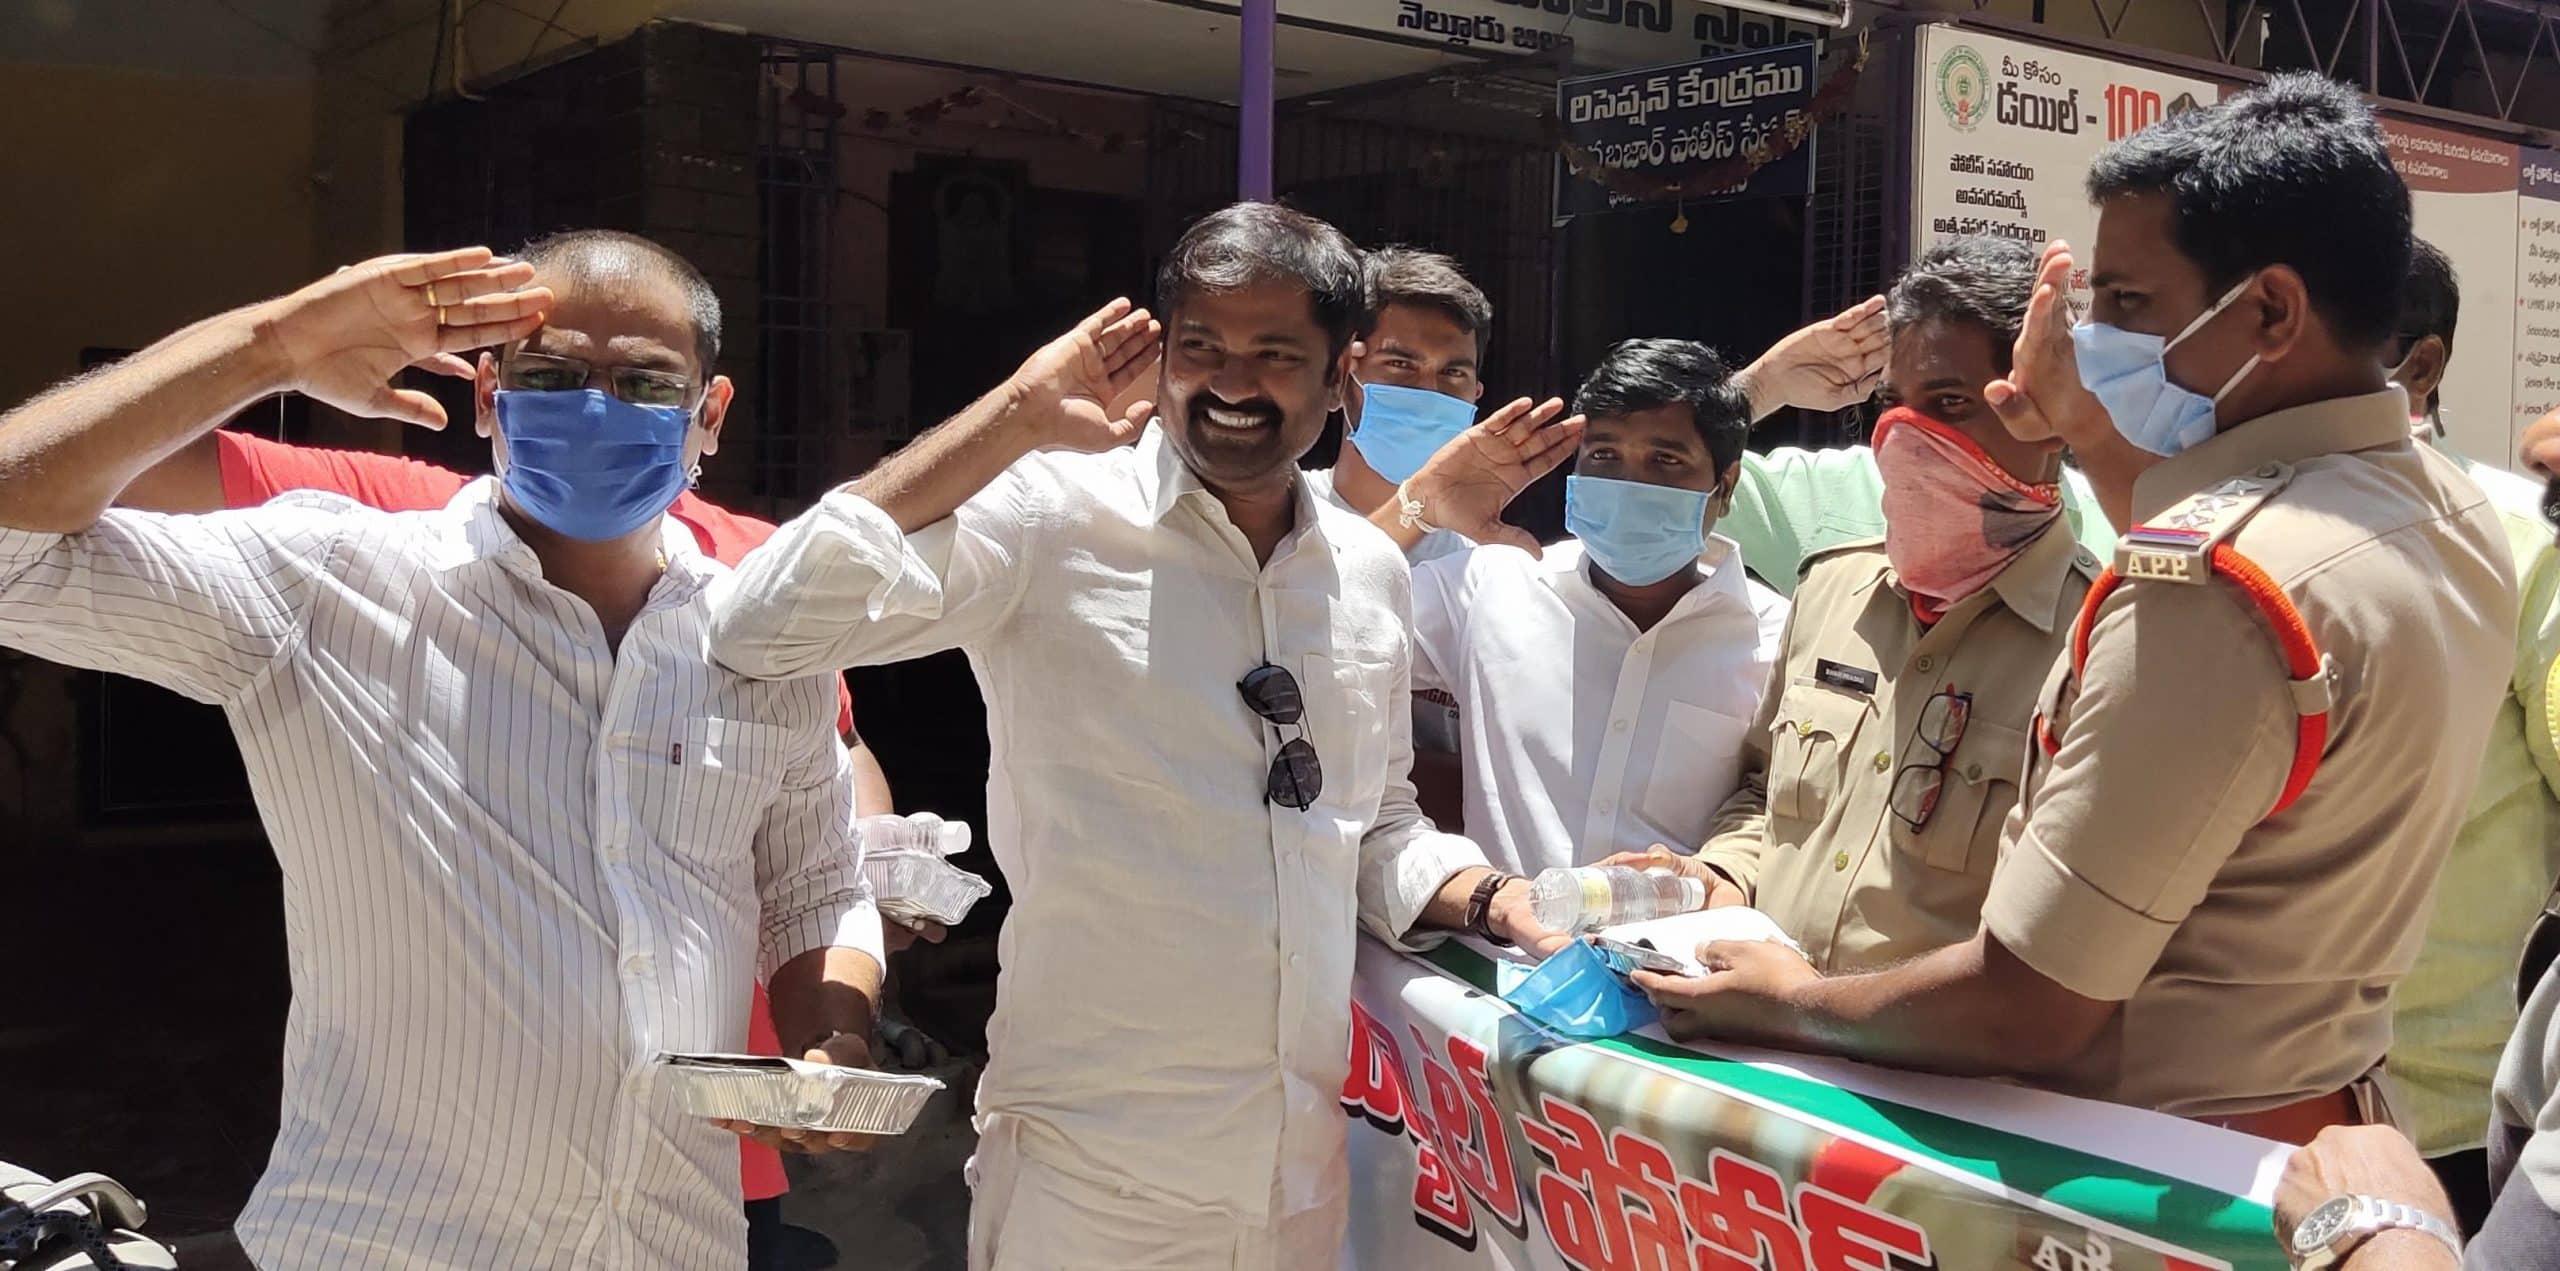 Thalluru Ramu (నవ నిర్మాణ సేన ) | Founder & Chairperson of Nava Nirmana Sena | theLeadersPage